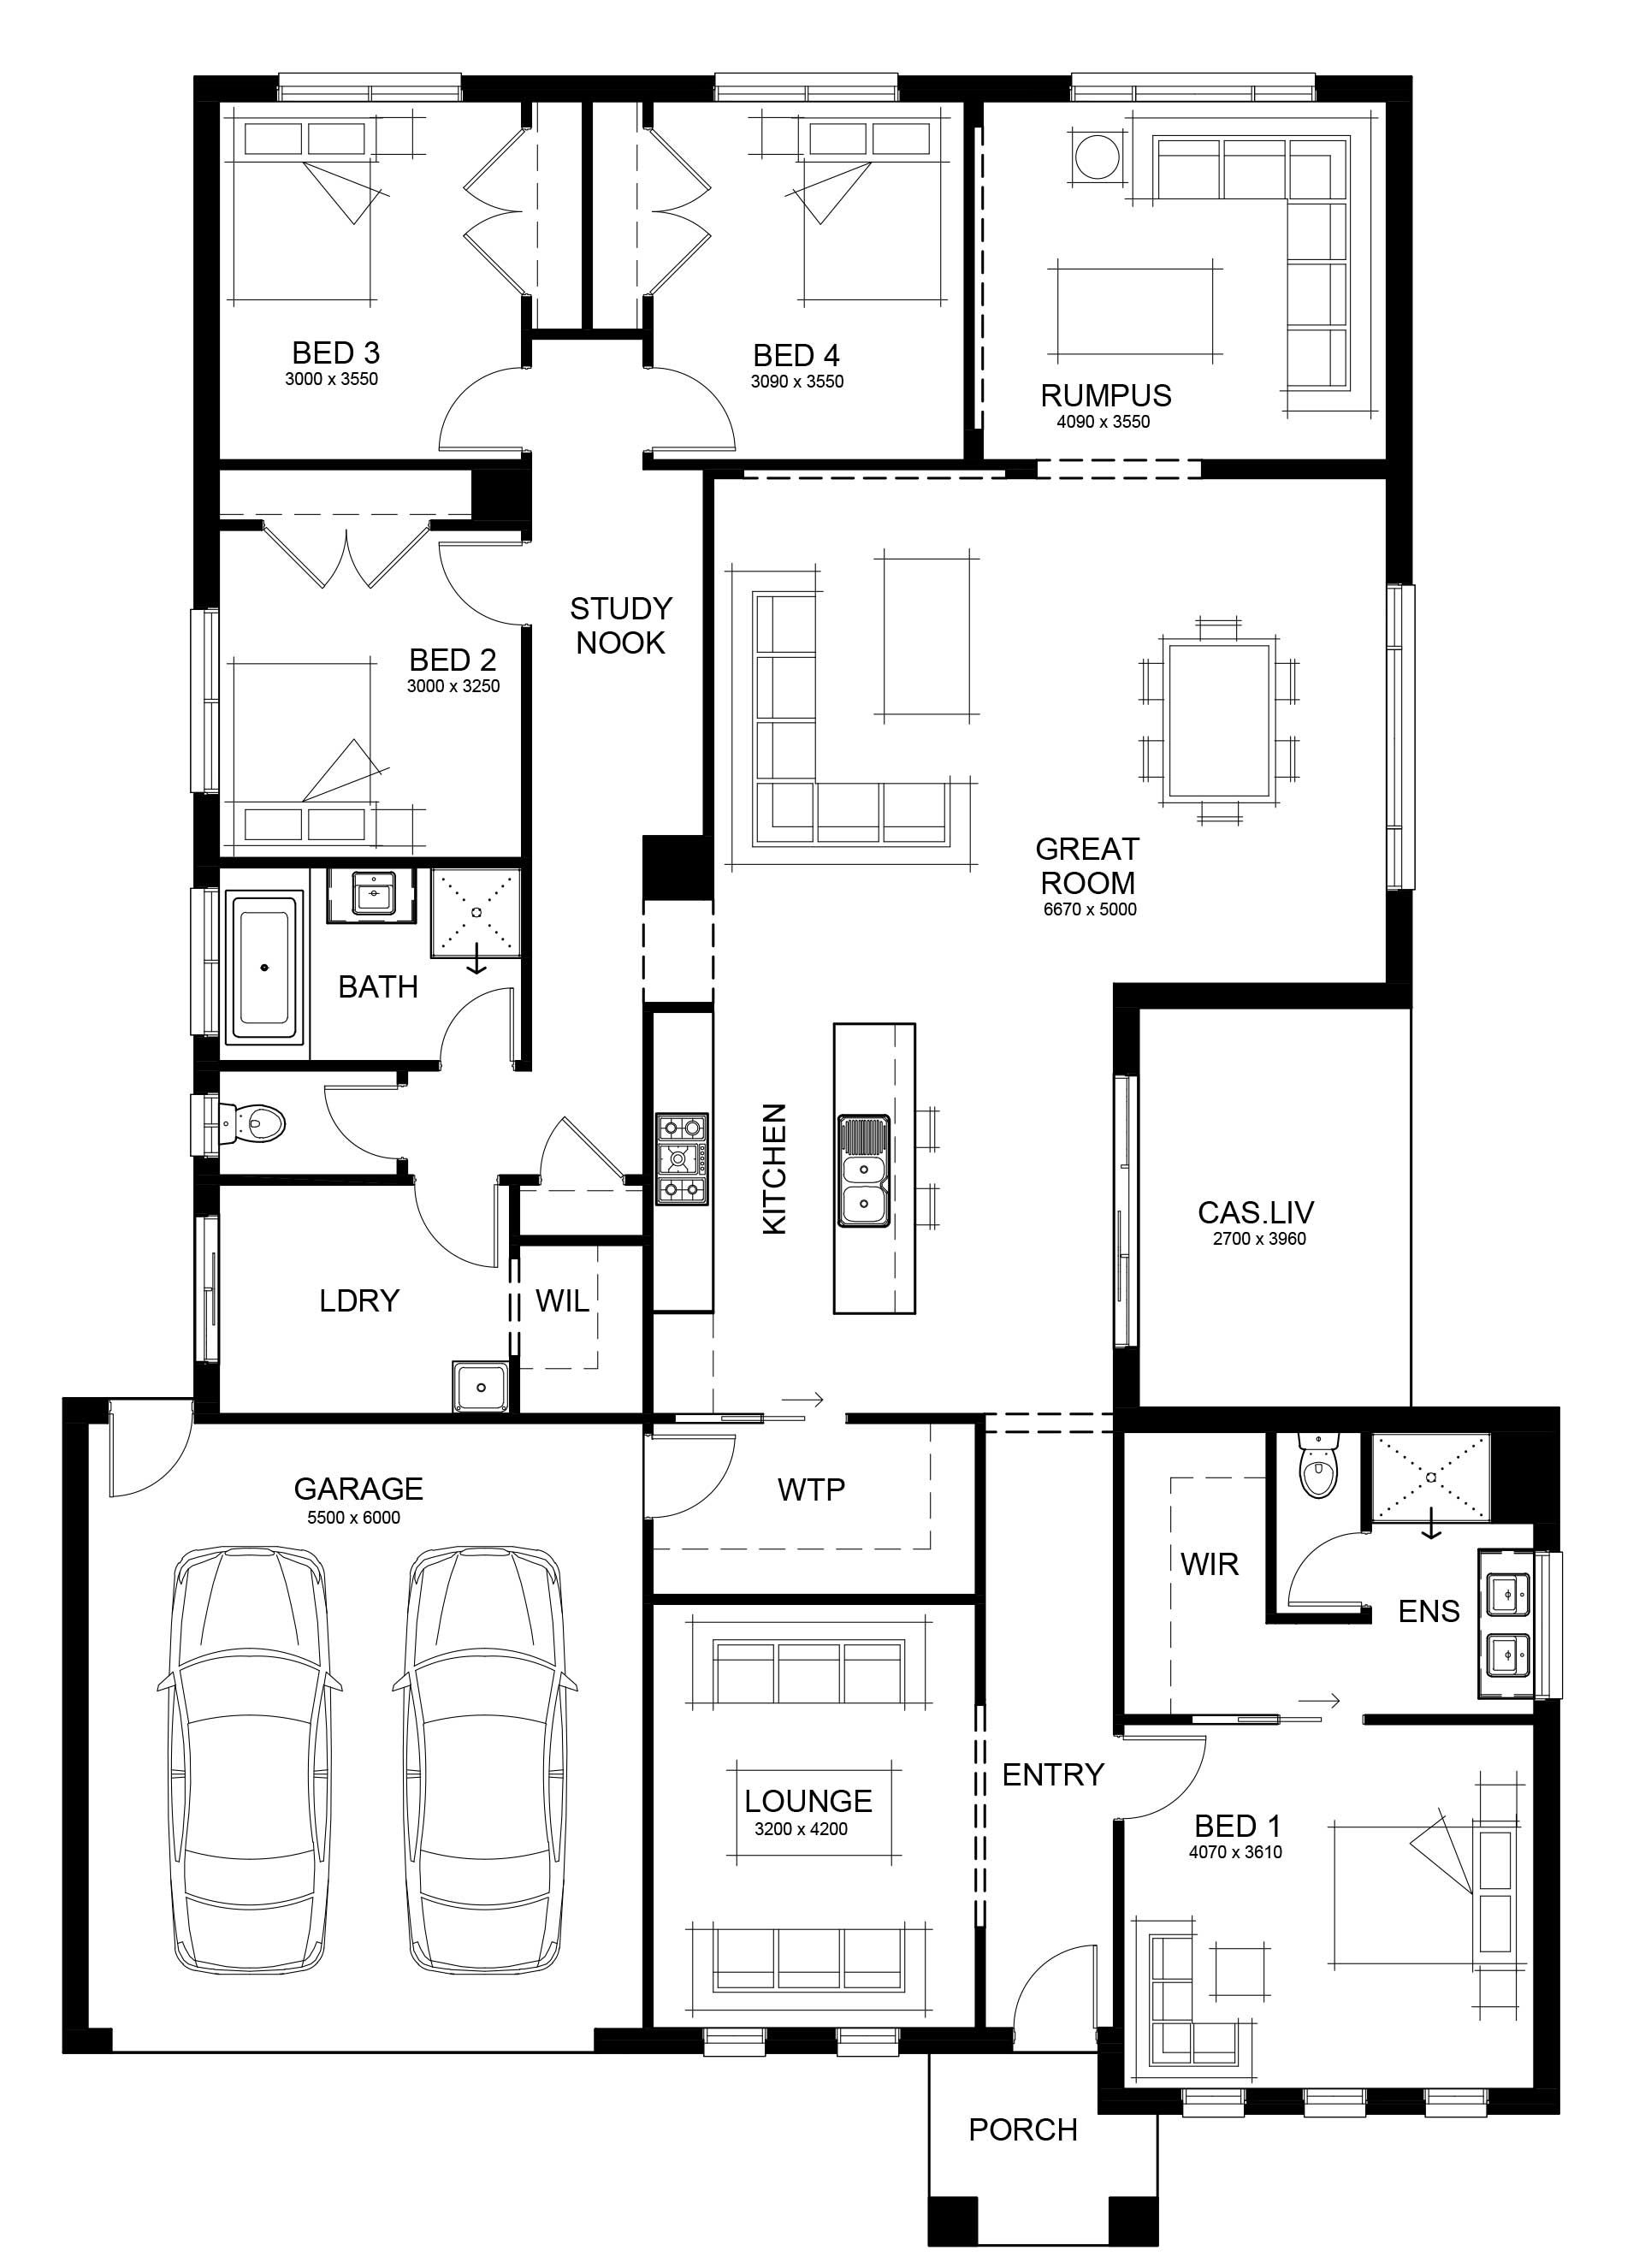 Floor Plans Of Taya 280 By Long Island Homes 4 Bedroom House Plans Floor Plans House Floor Plans